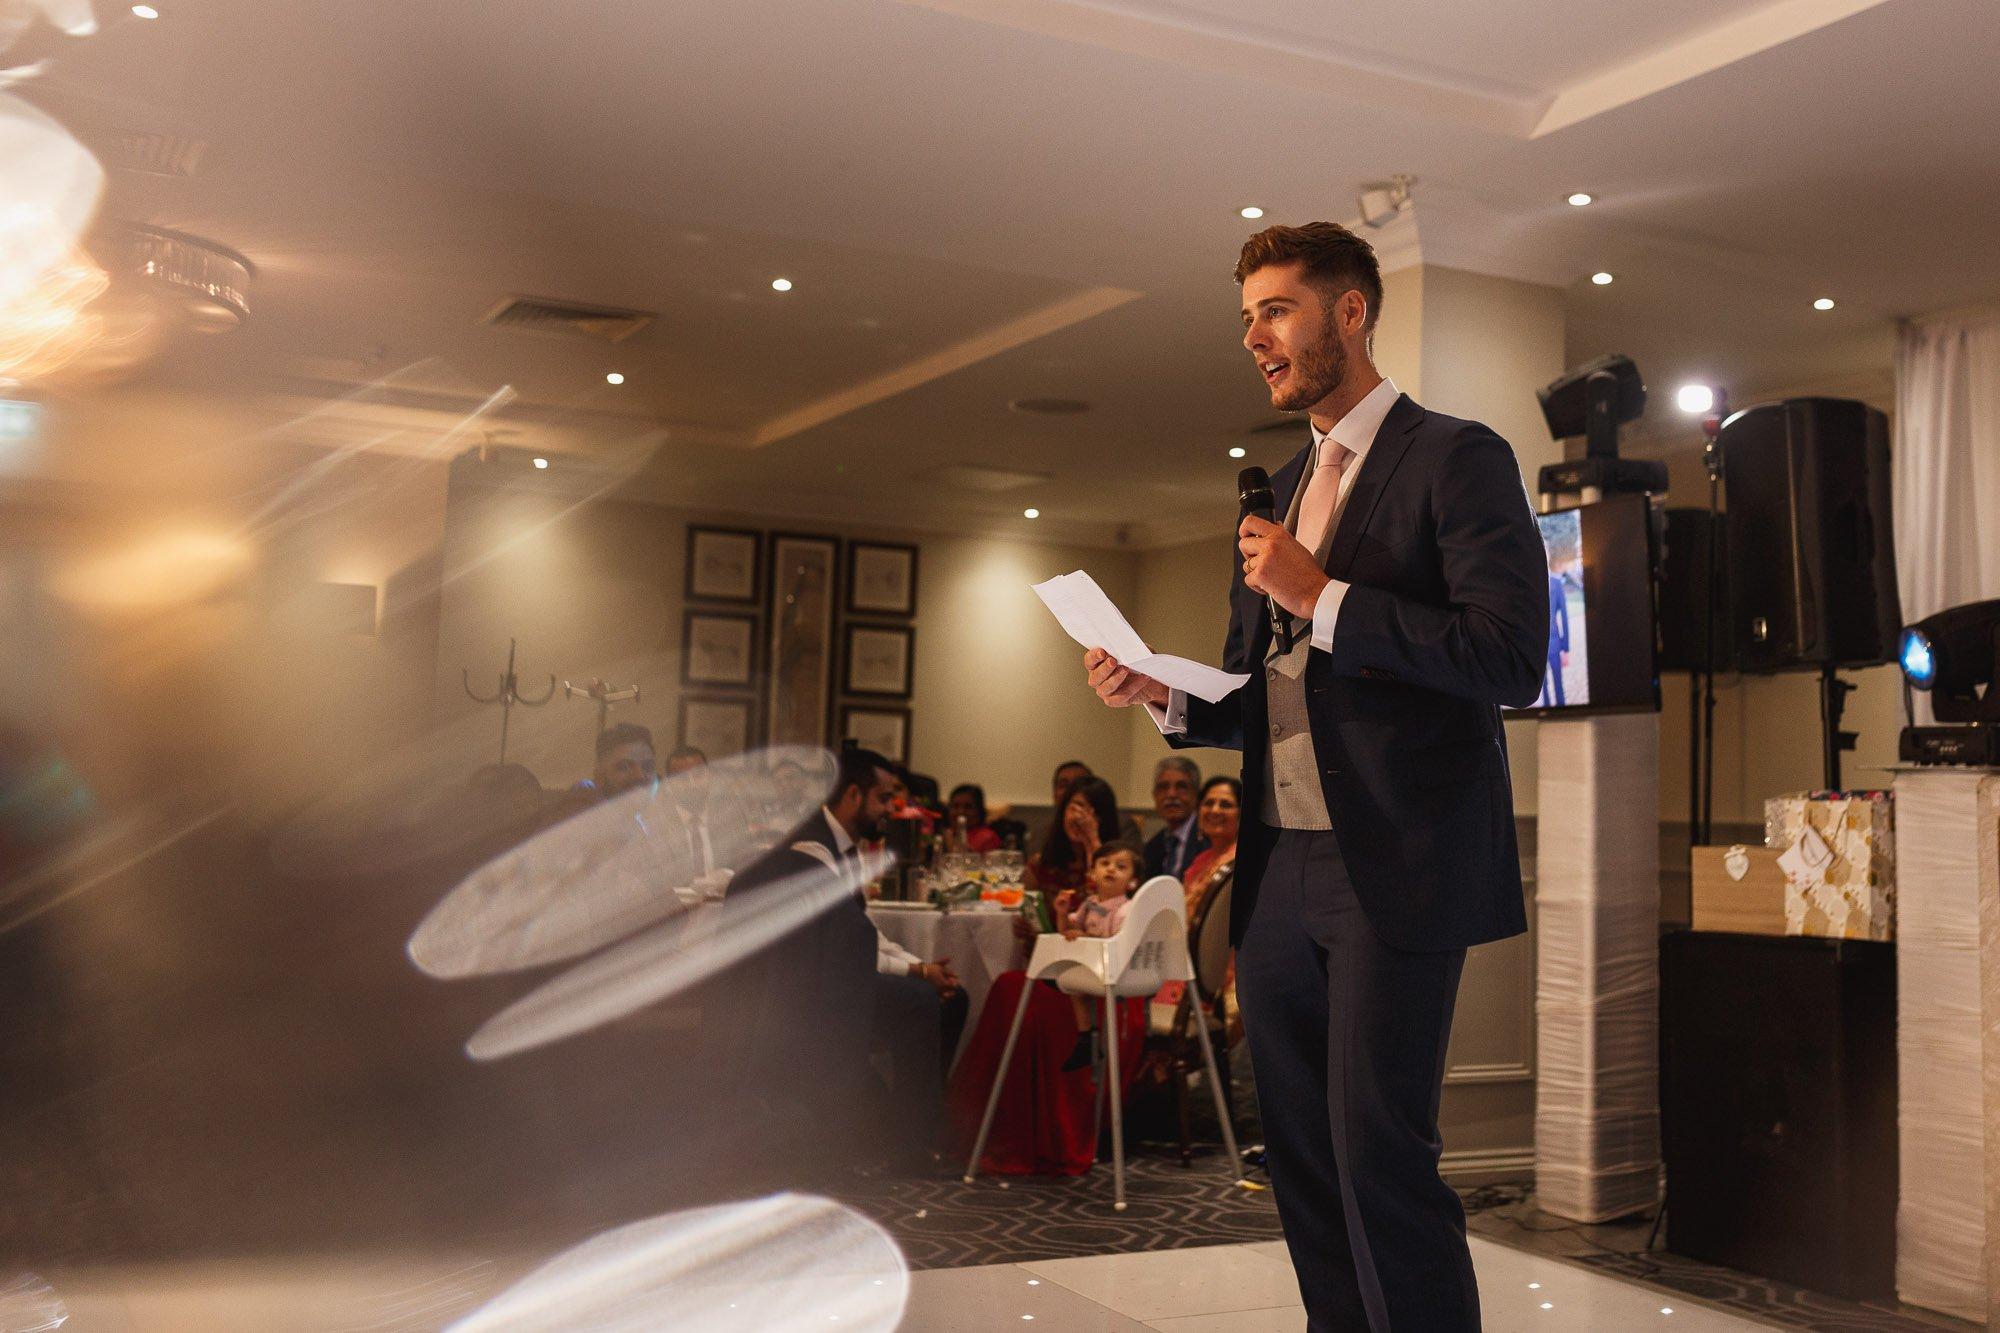 De Vere Wokefield Estate, Asian wedding photographer, reception, grooms speech